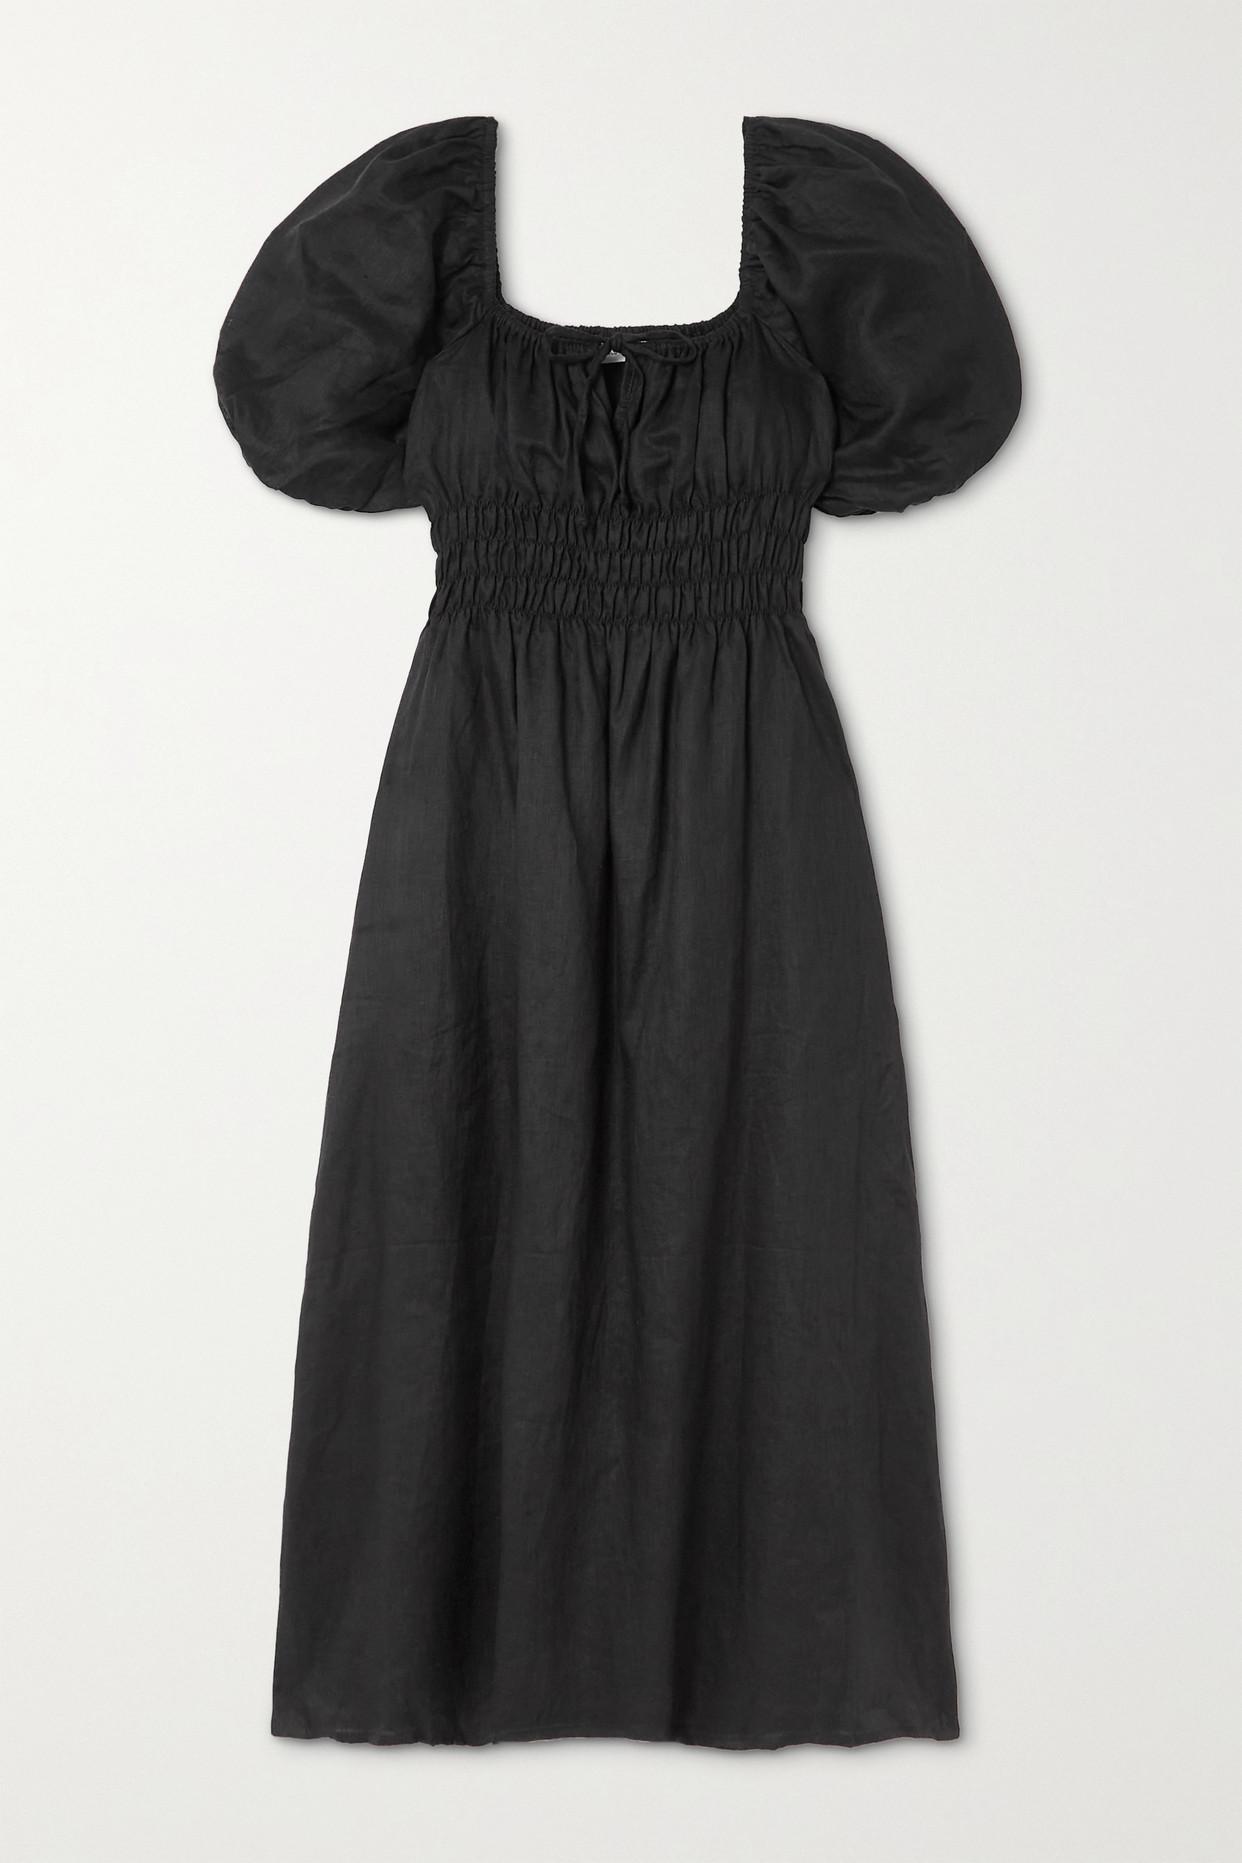 FAITHFULL THE BRAND - + Net Sustain Maurelle Tie-detailed Shirred Linen Midi Dress - Black - small